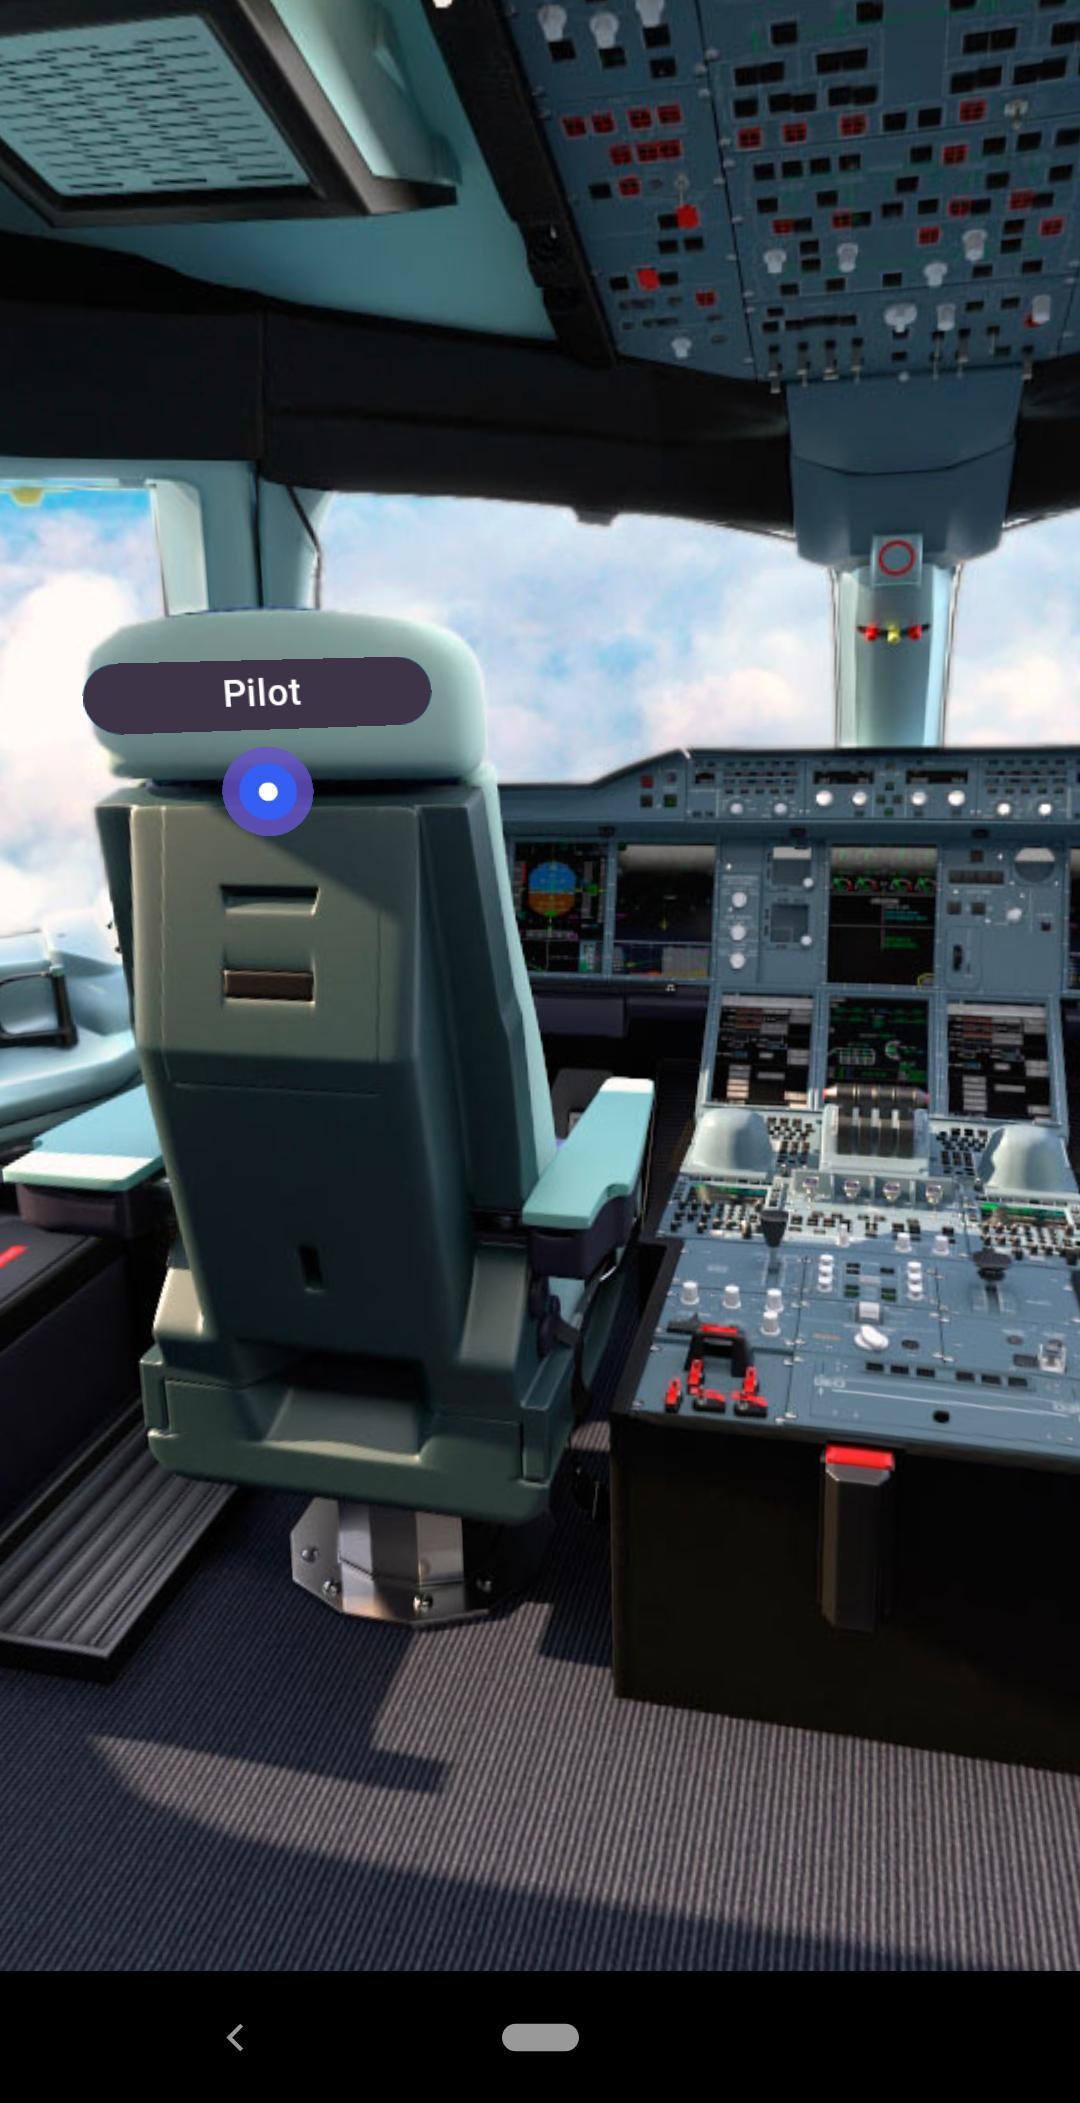 iflyA380 mobile app augmented reality cockpit